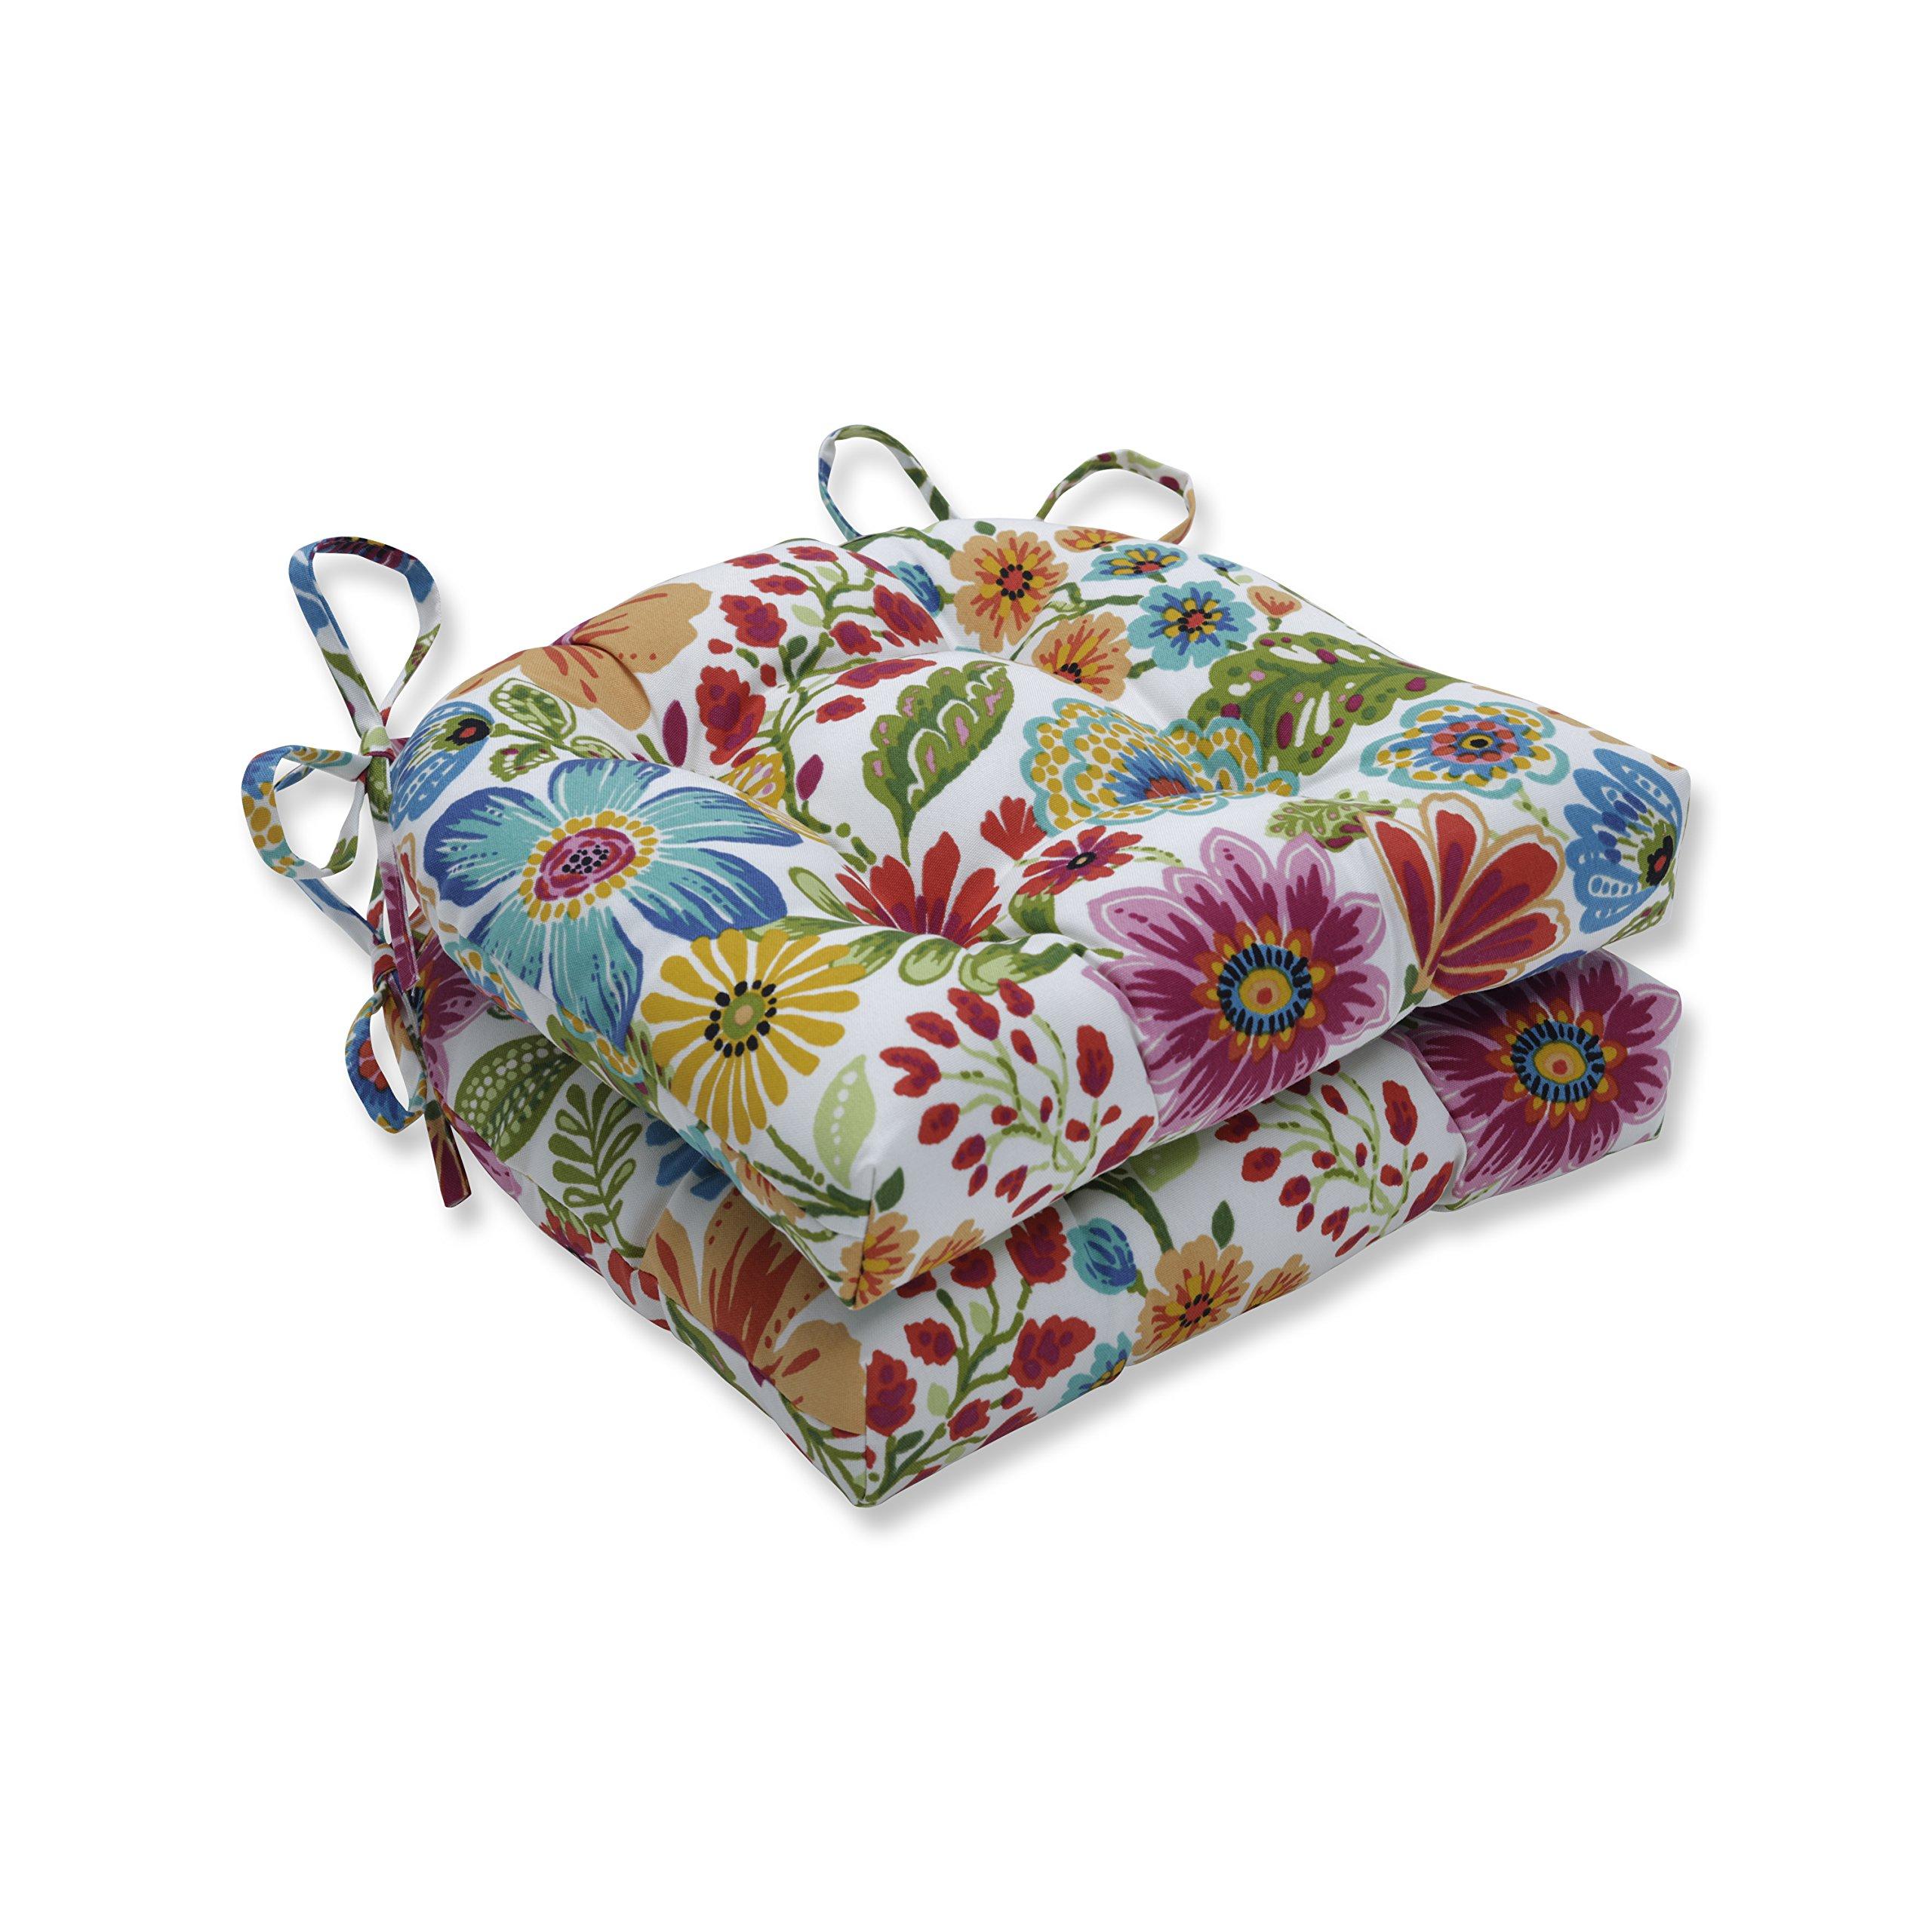 Pillow Perfect Outdoor | Indoor Gregoire Prima Reversible Chair Pad (Set of 2), Blue 16 X 15.5 X 4